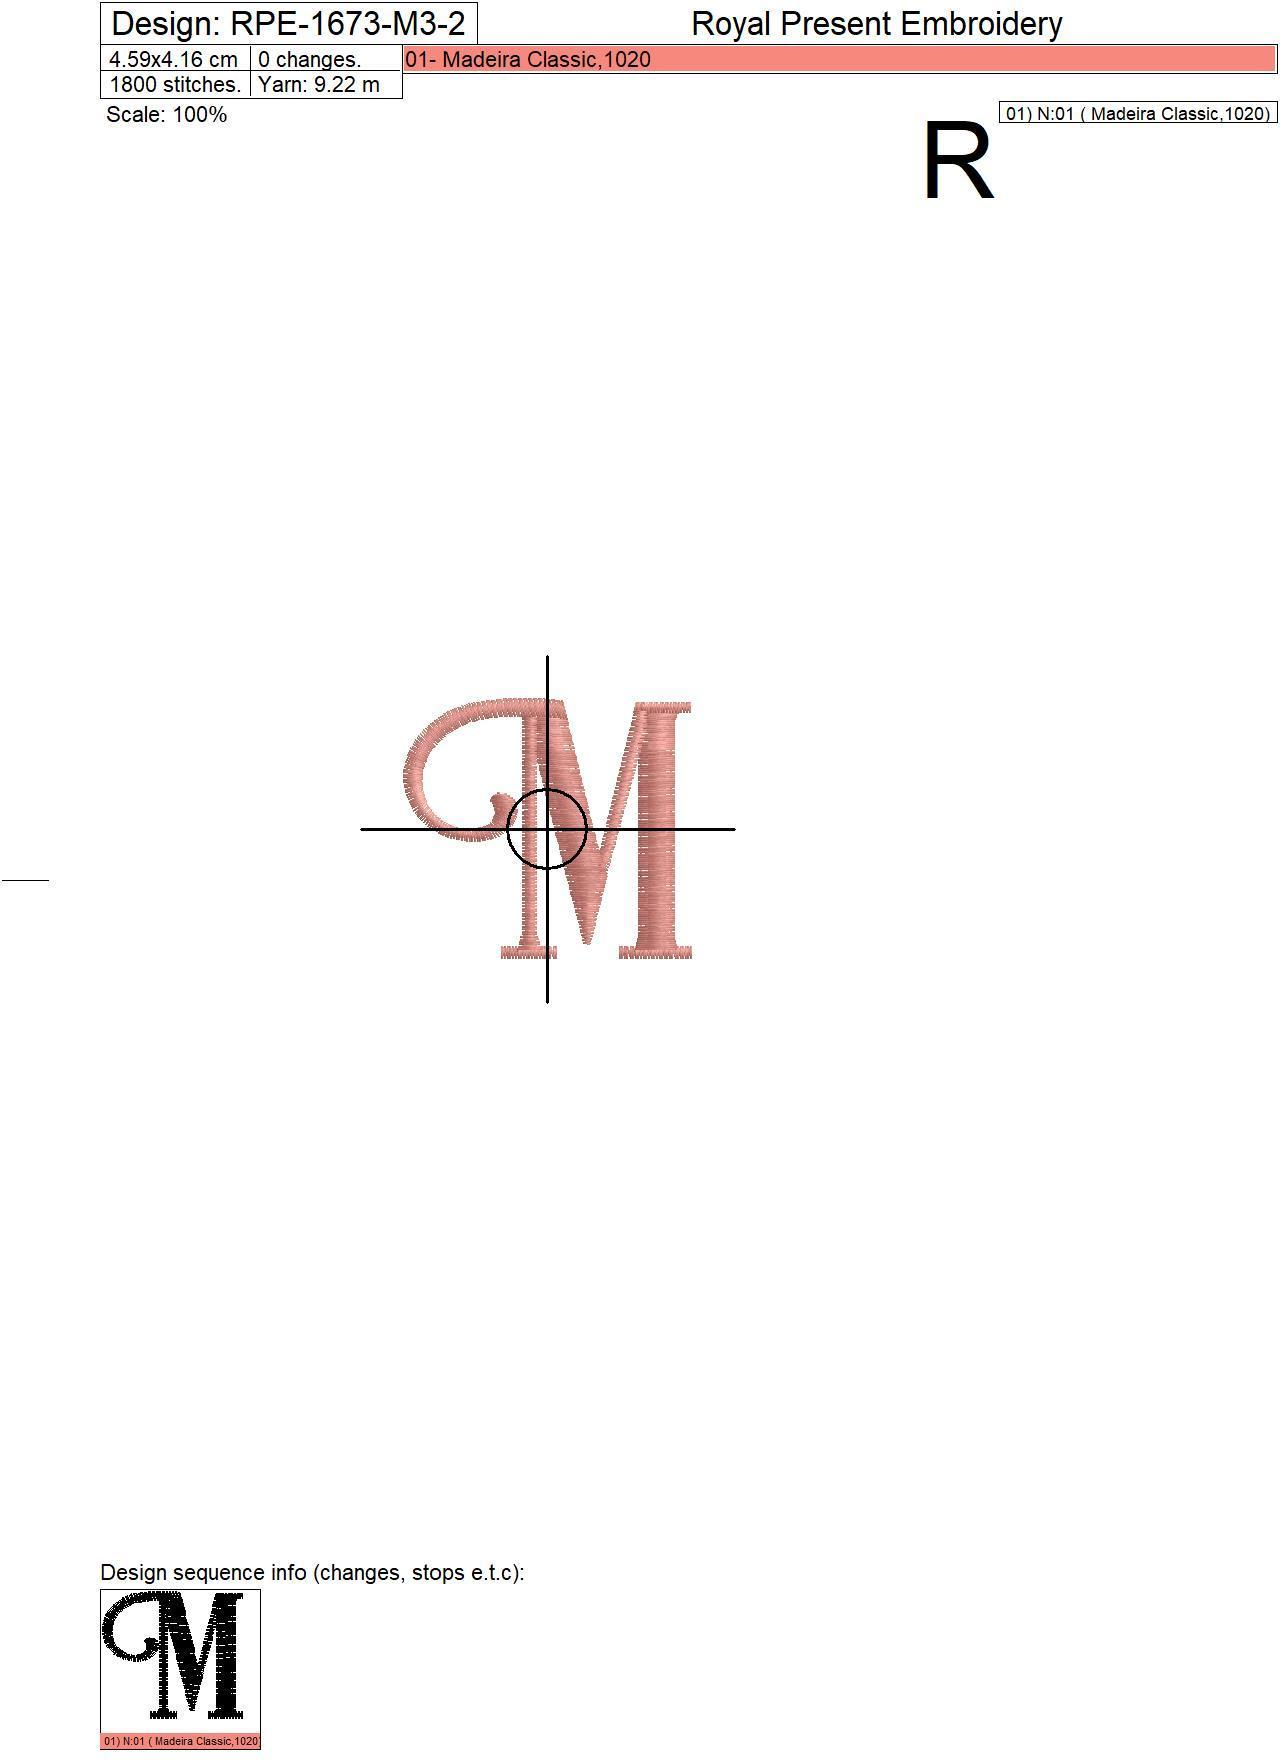 Capital Letter M Embroidery design V3